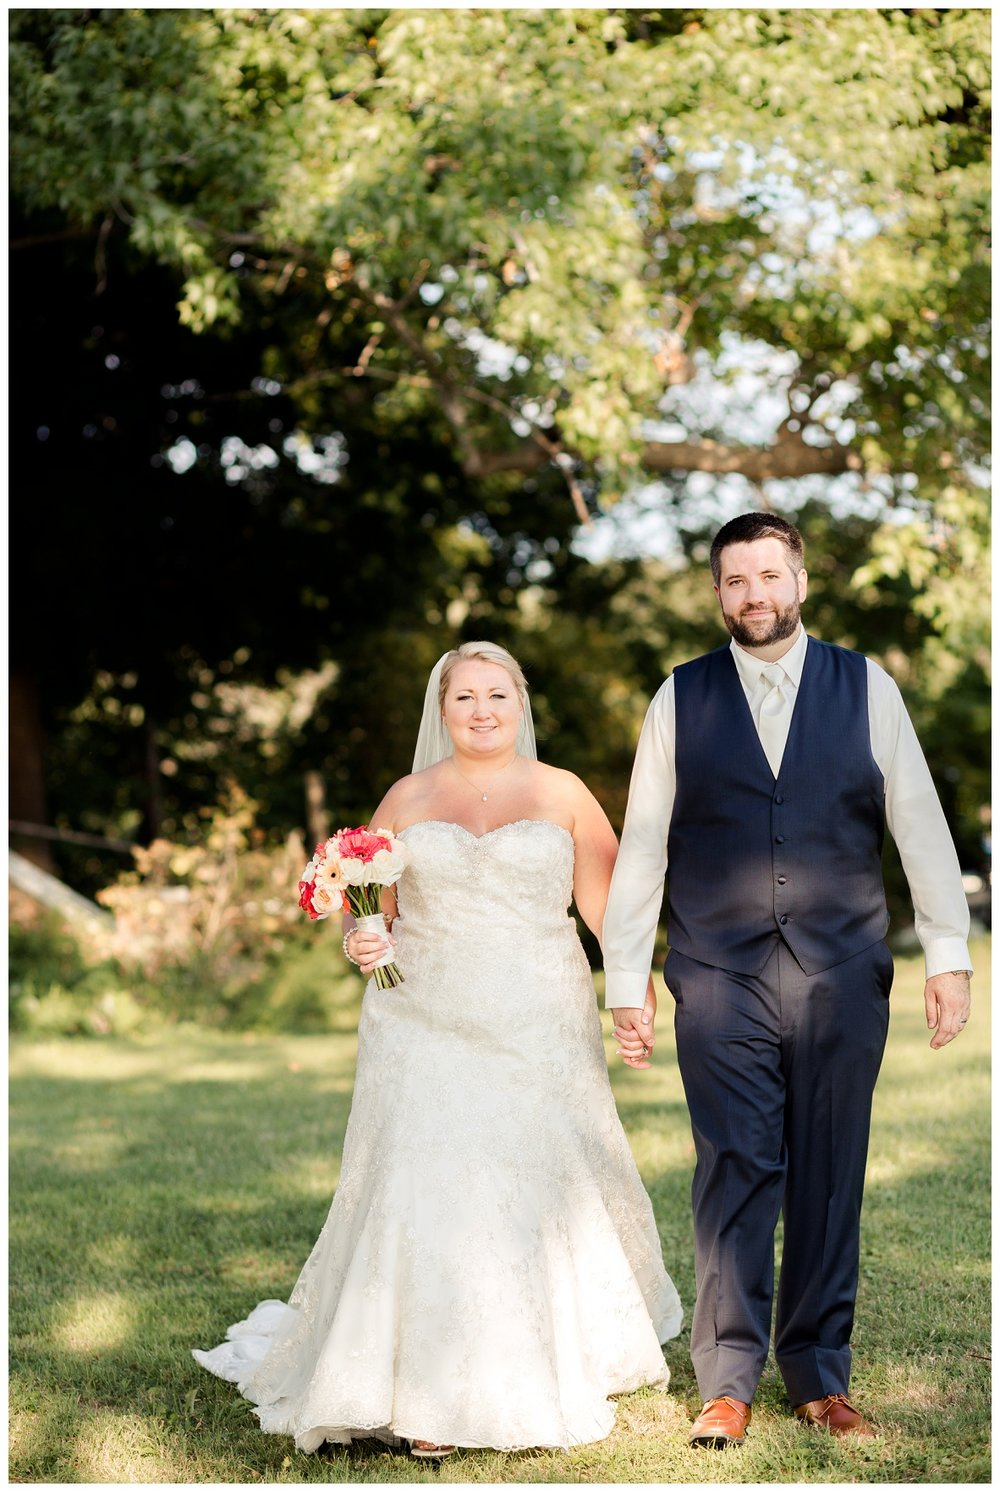 Mr. and Mrs. Kramp_0050.jpg